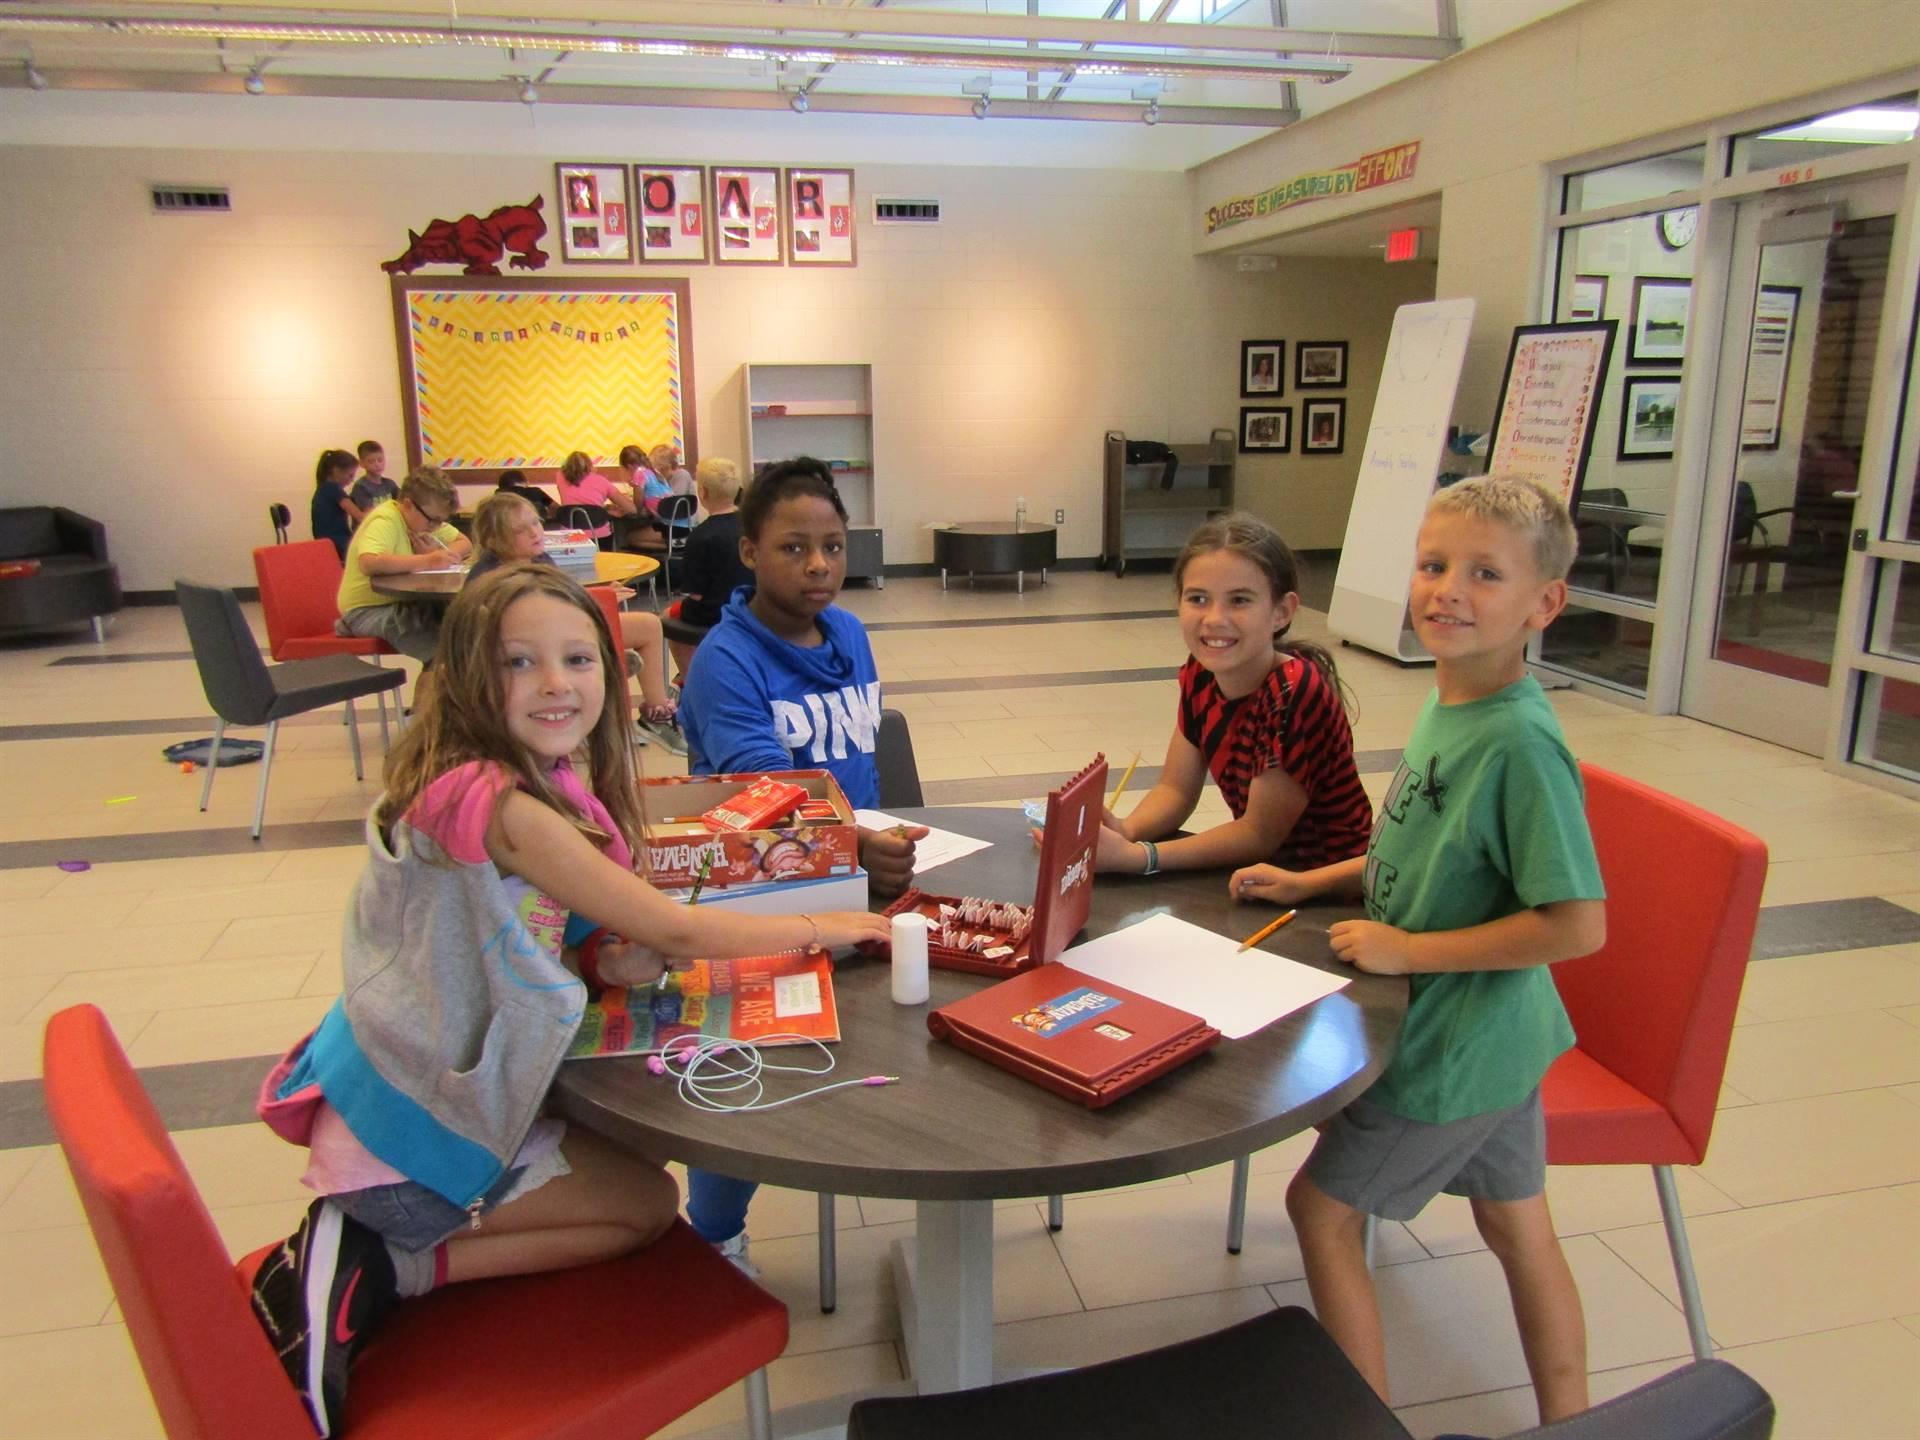 Students enjoying games at indoor recess